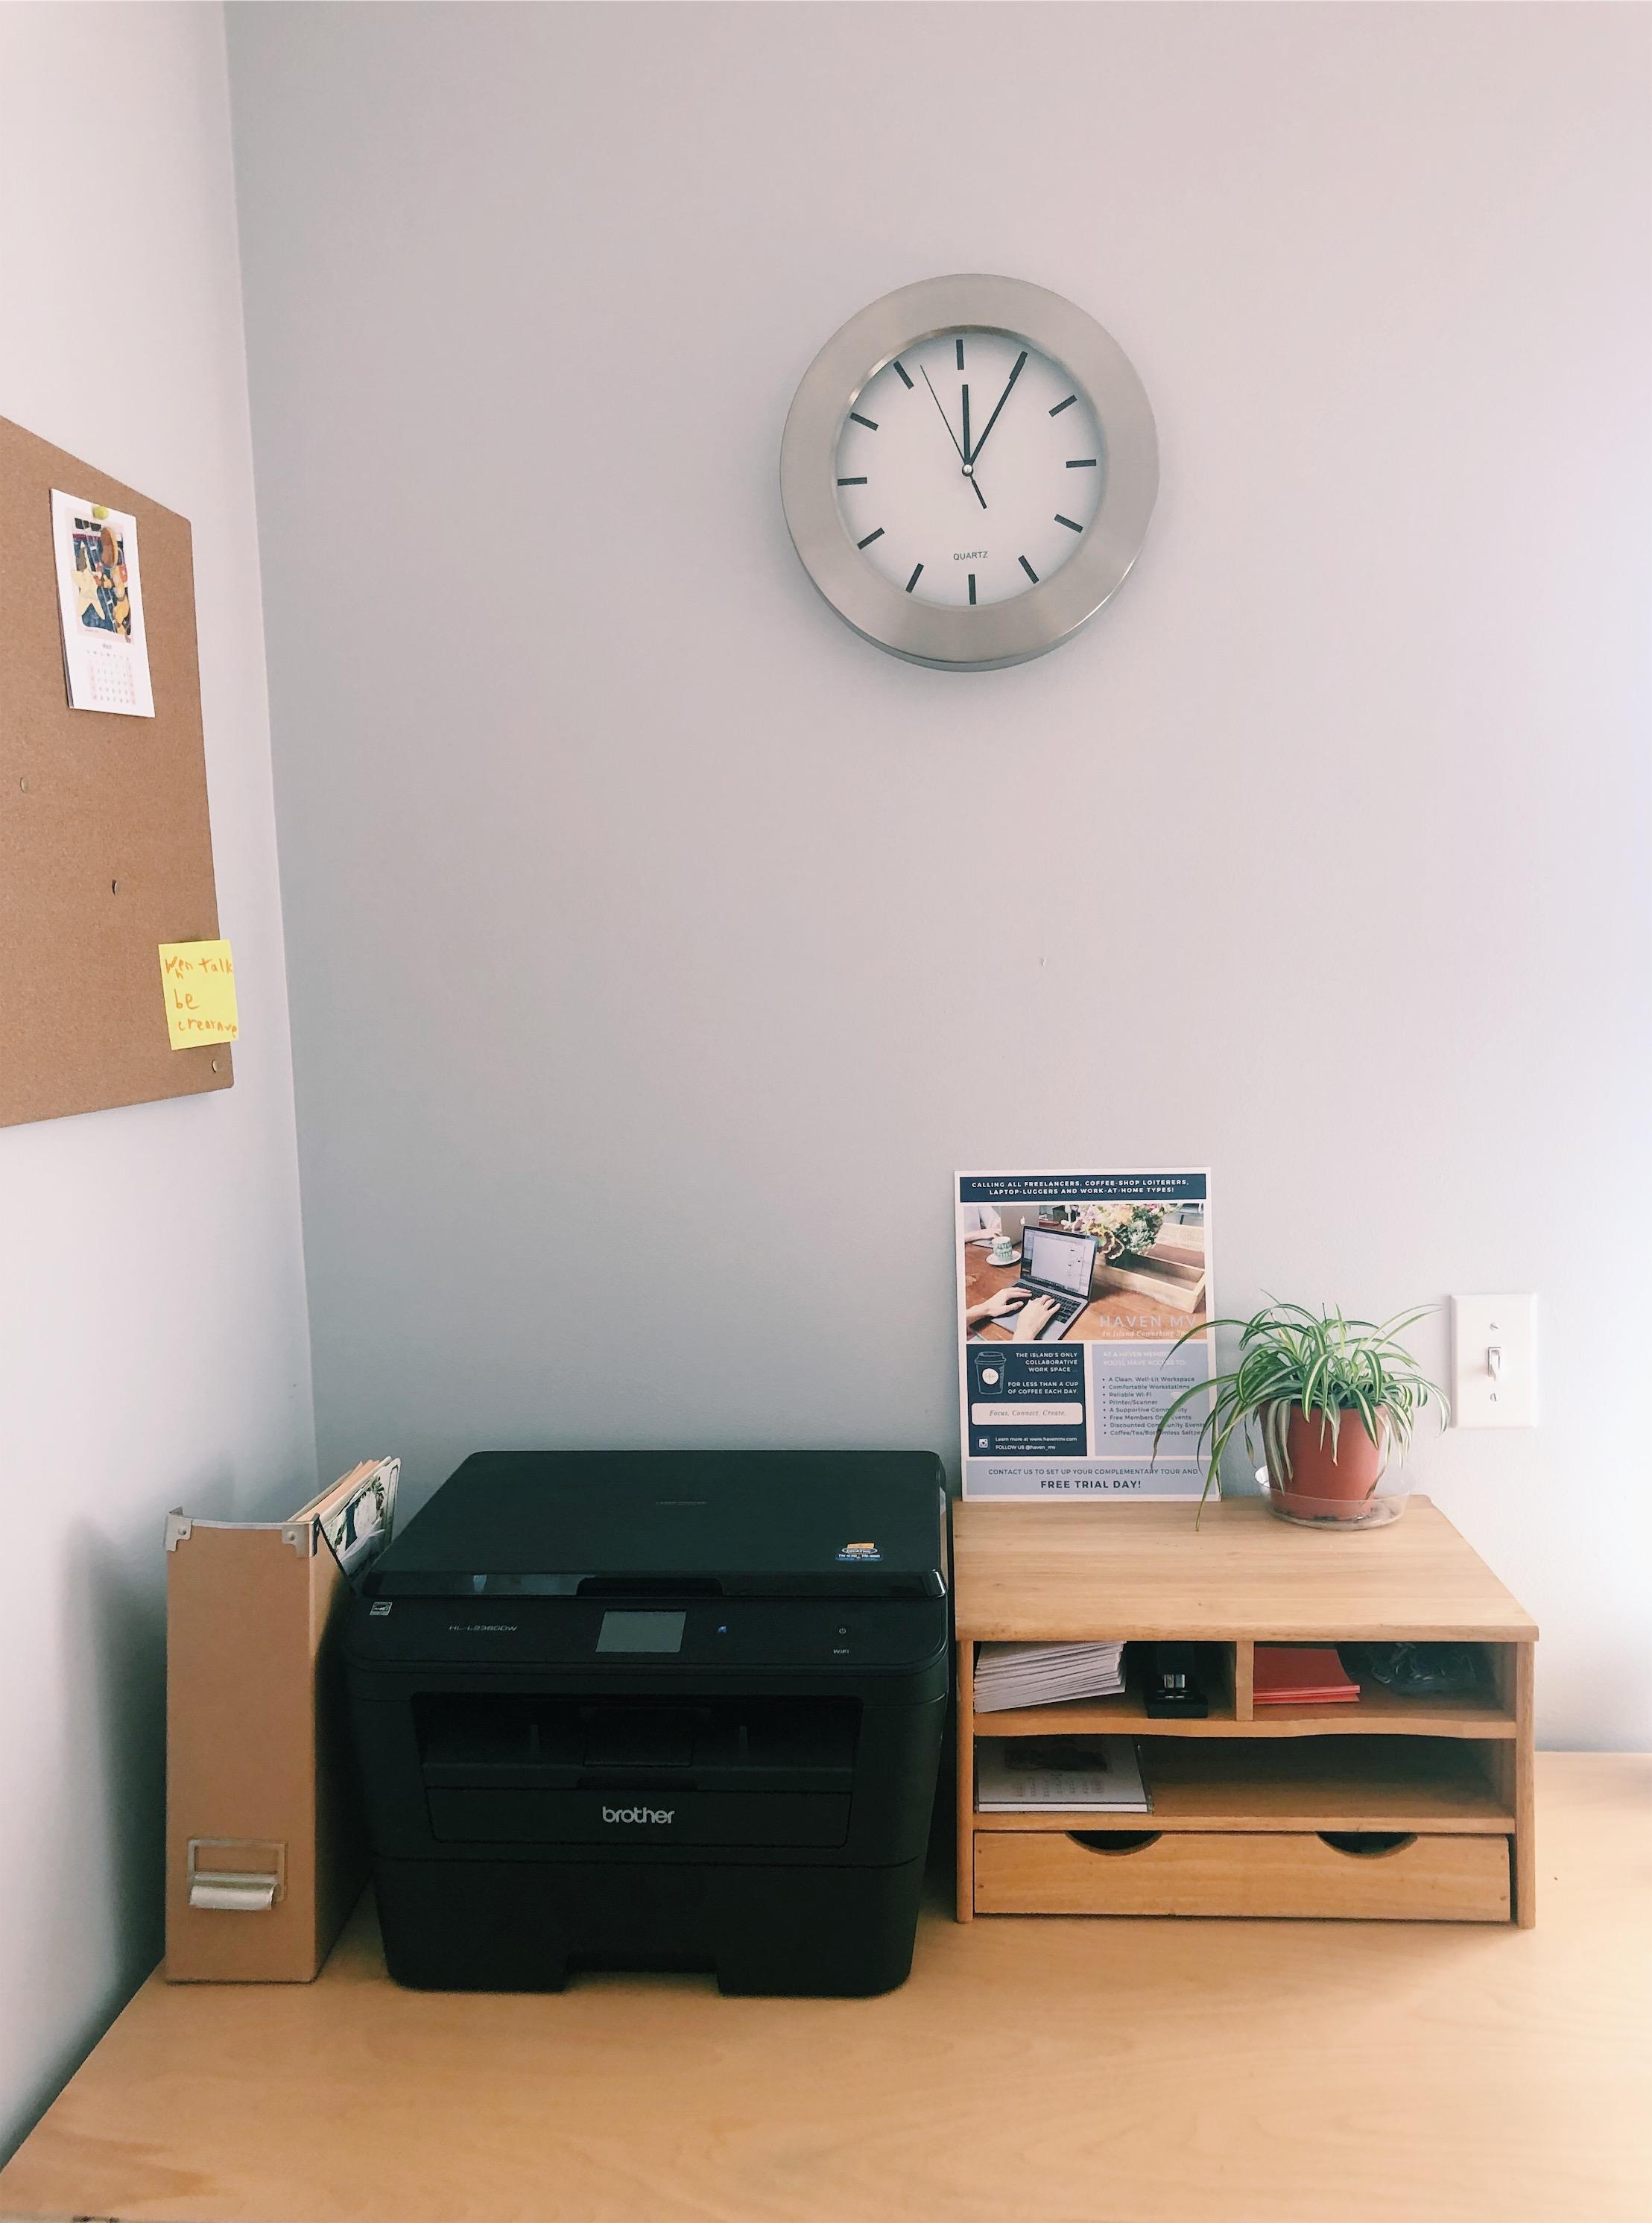 Print/copy station.